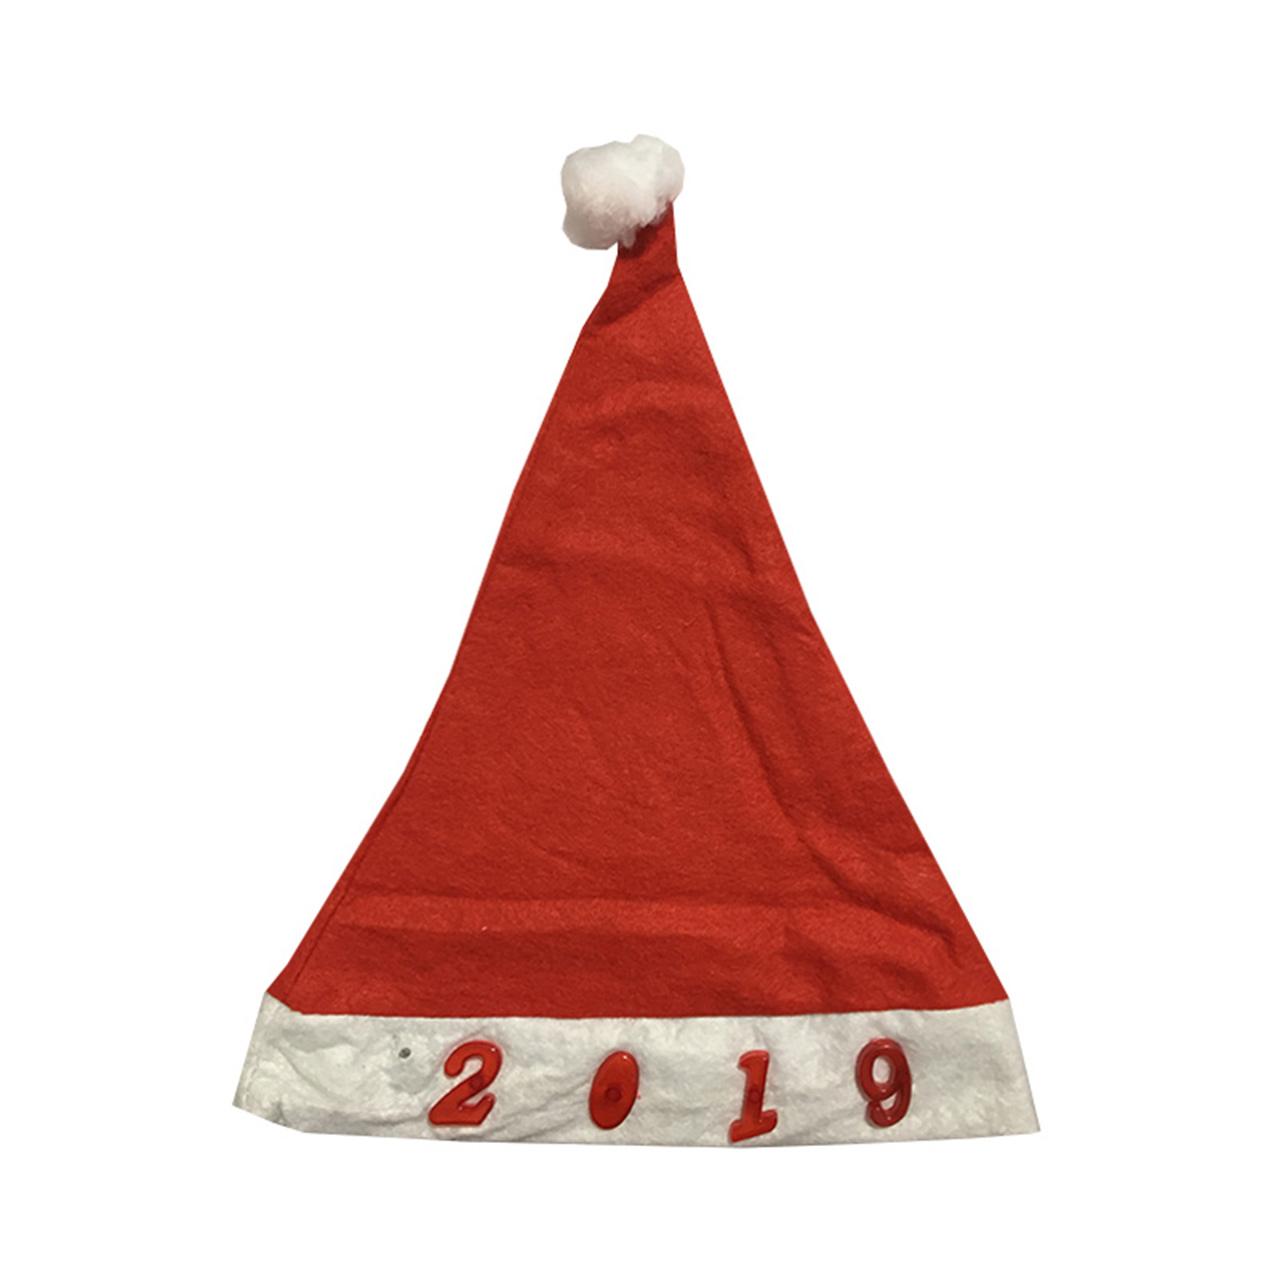 عکس کلاه سورتک طرح بابانوئل کریسمس ۲۰۱۹ مدل STCH102